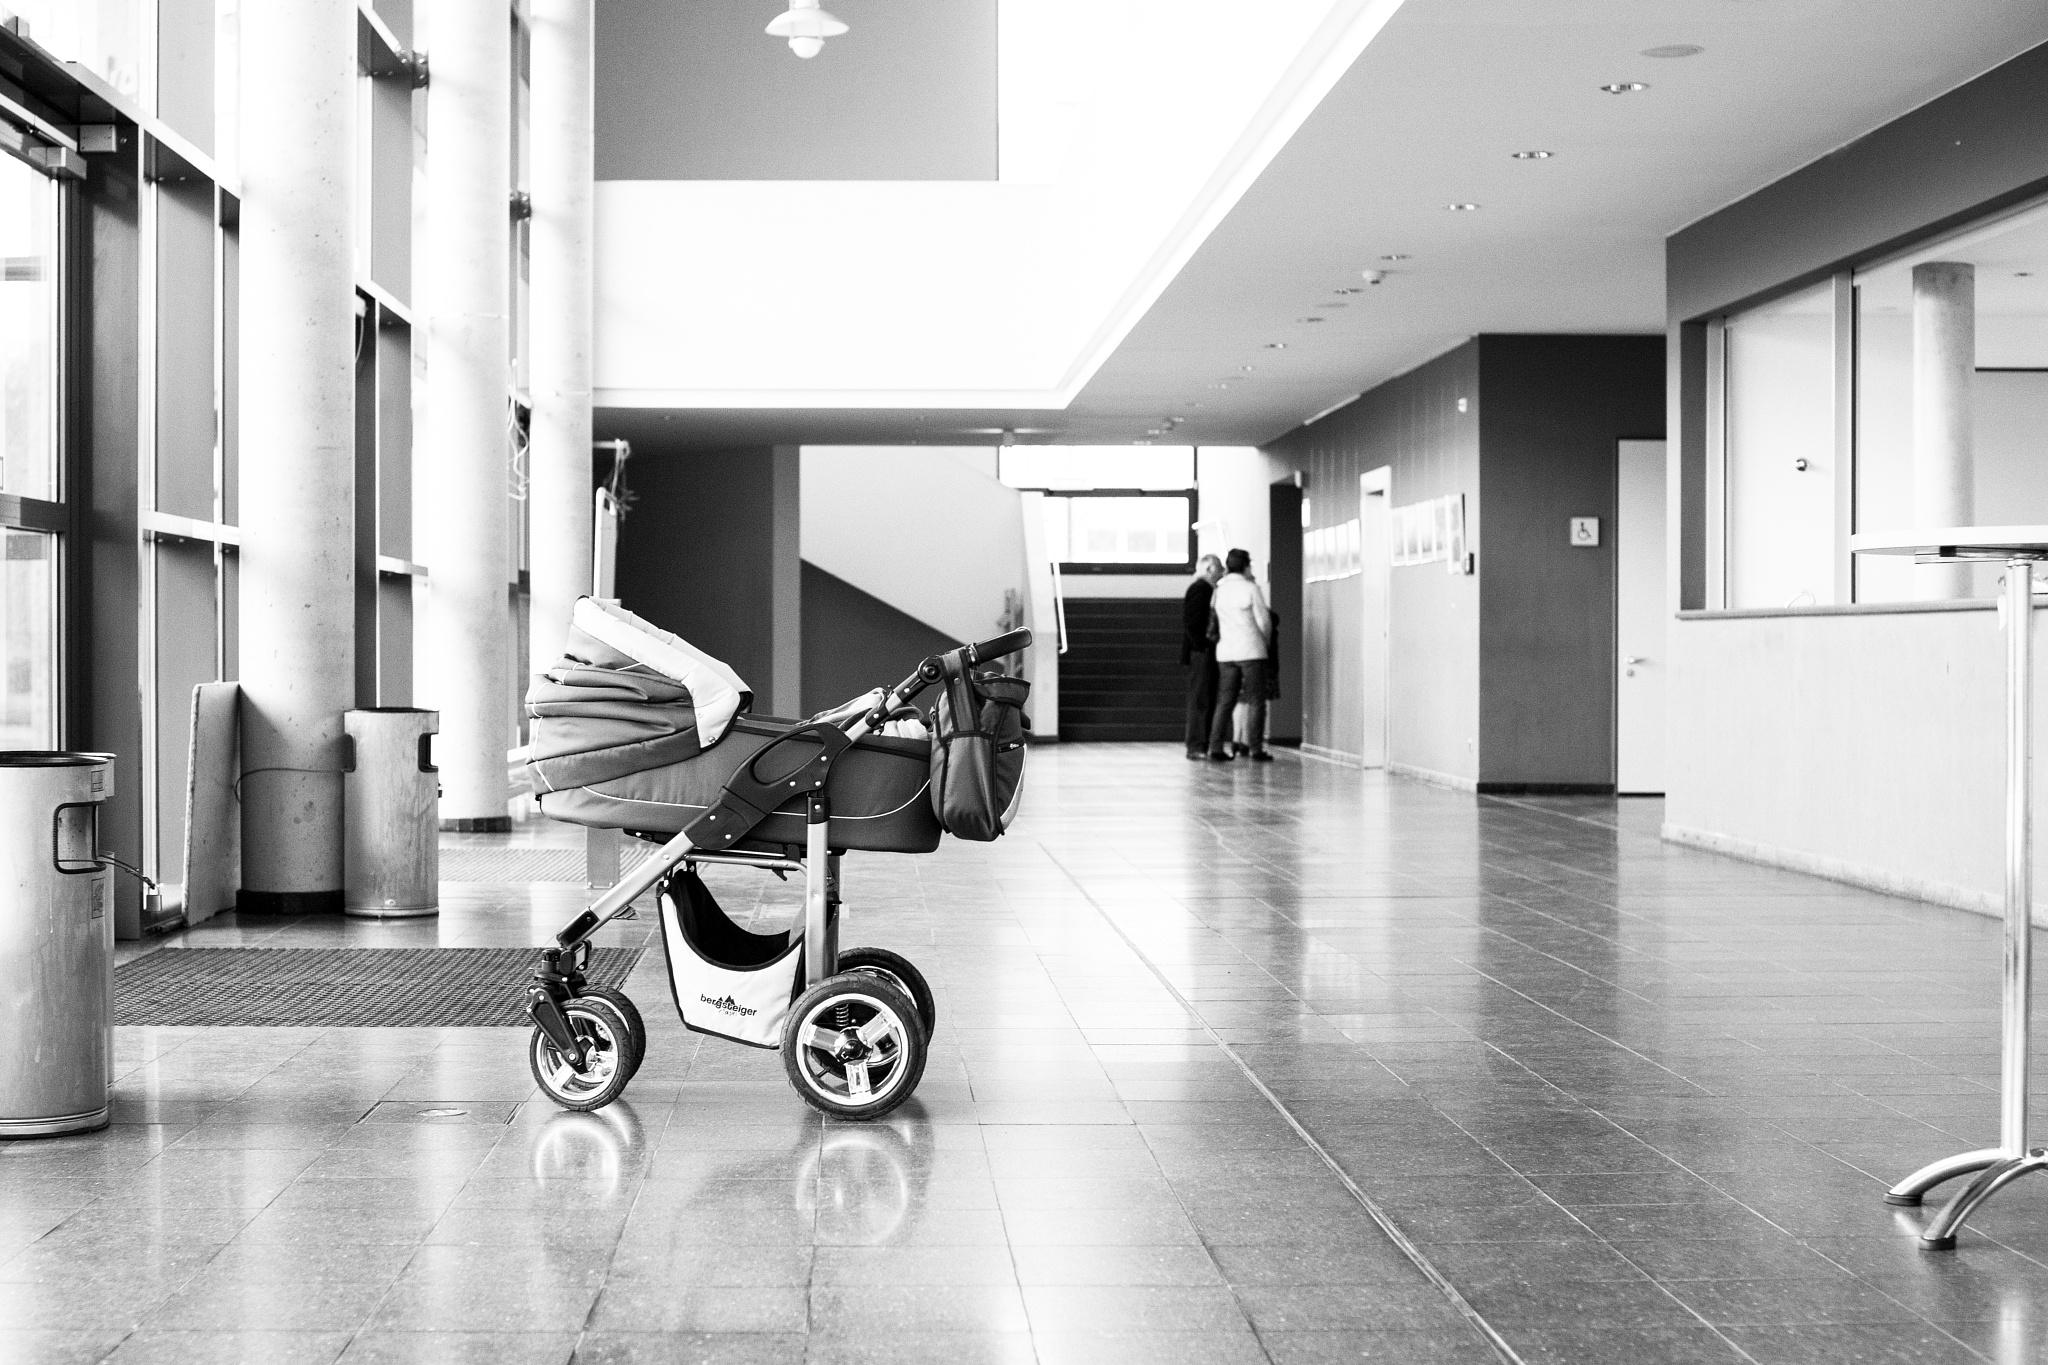 lonely by Lothar Bendix